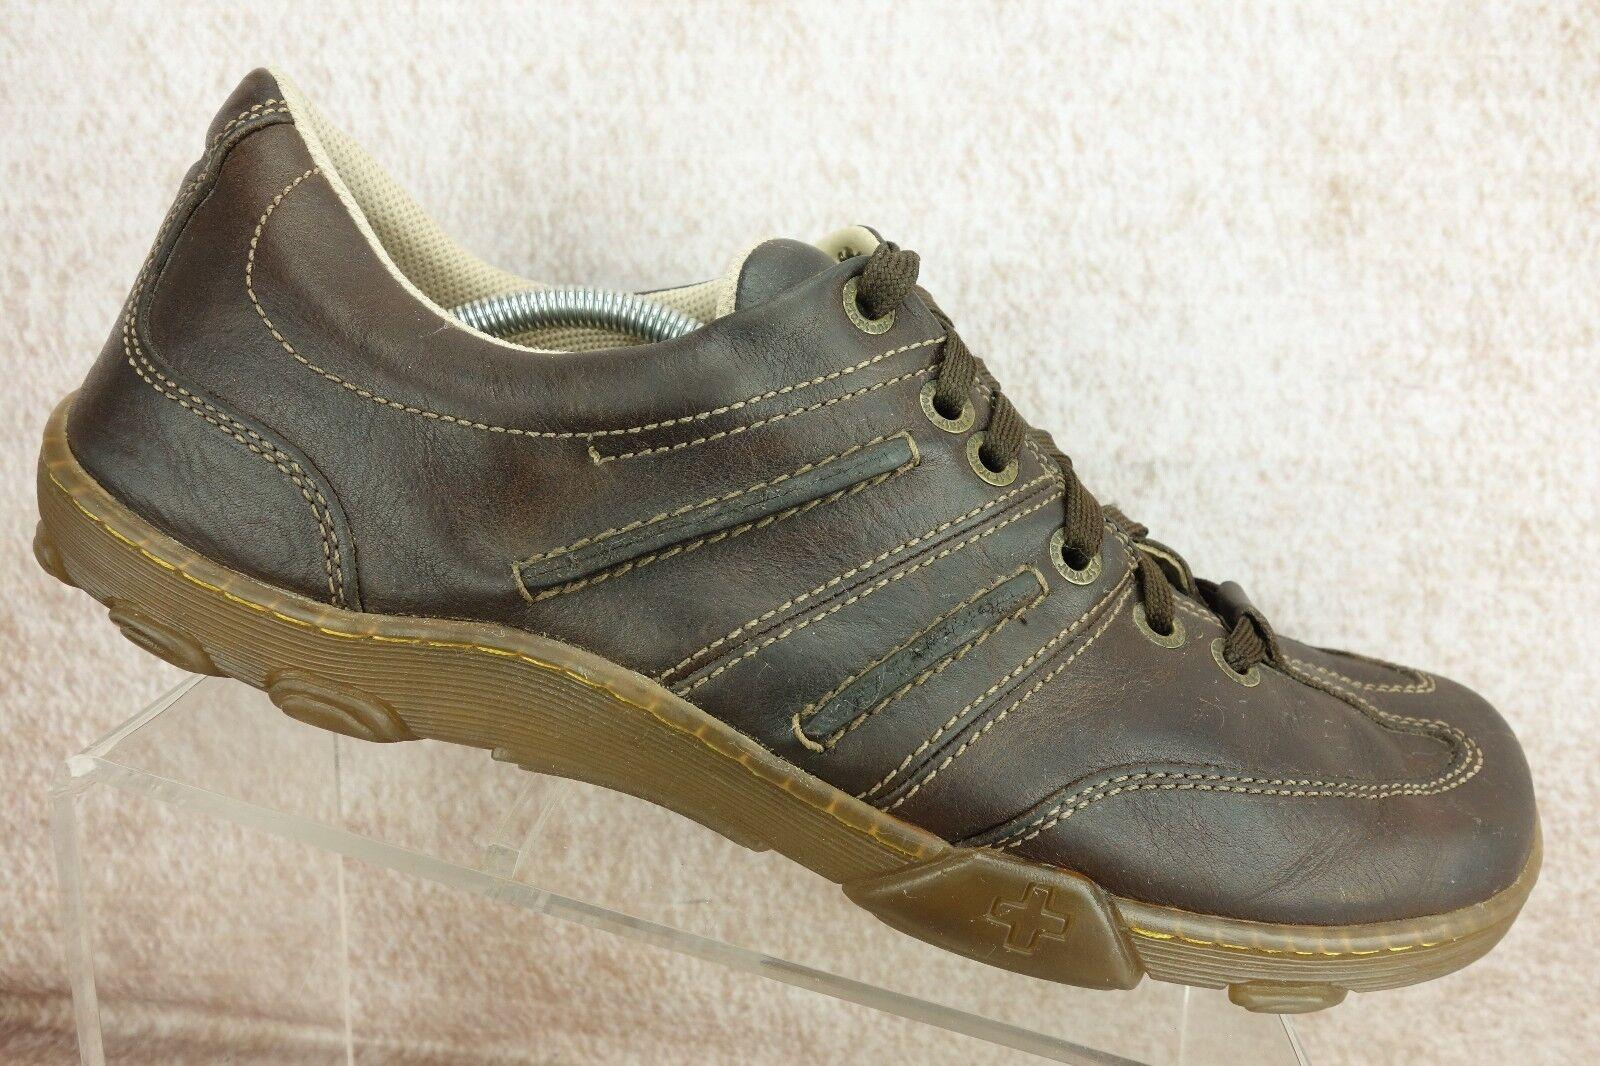 Doc Dr. Martens Brown Leather Casual Walking Oxford Shoes Shoes Shoes Men's Size 13 M 80733b